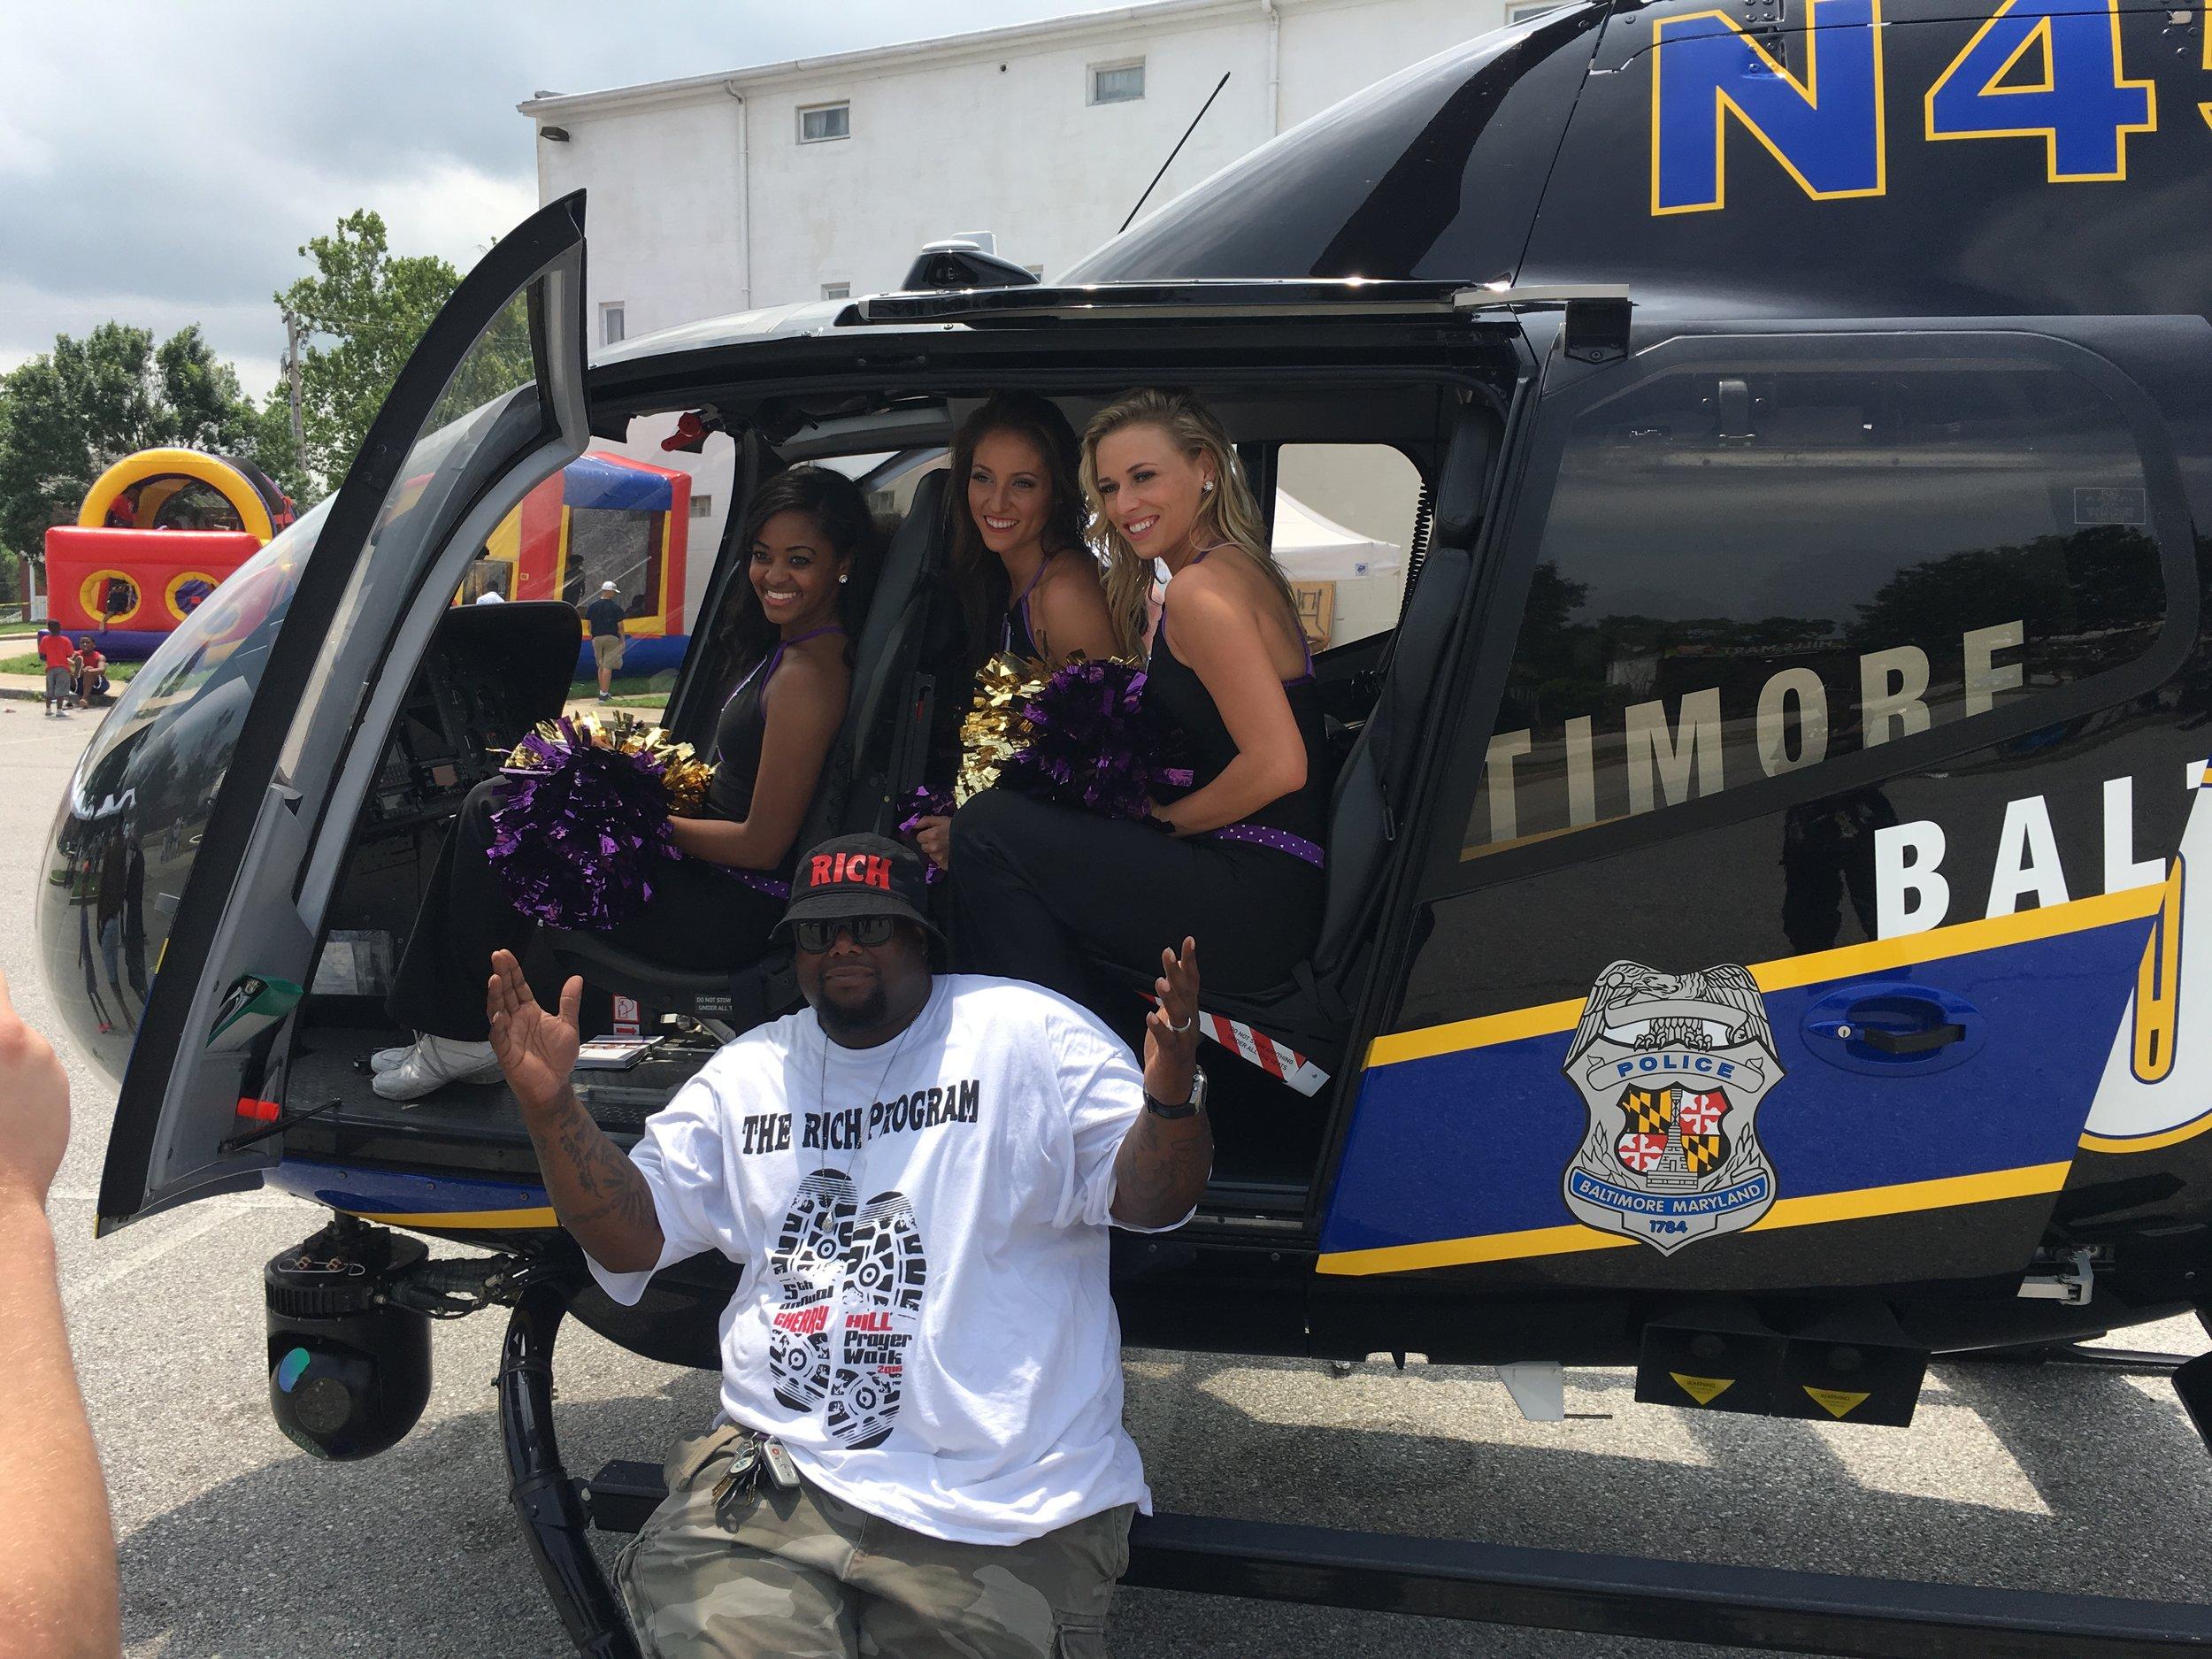 Michael Battle Jr and Baltimore Raven cheerleaders